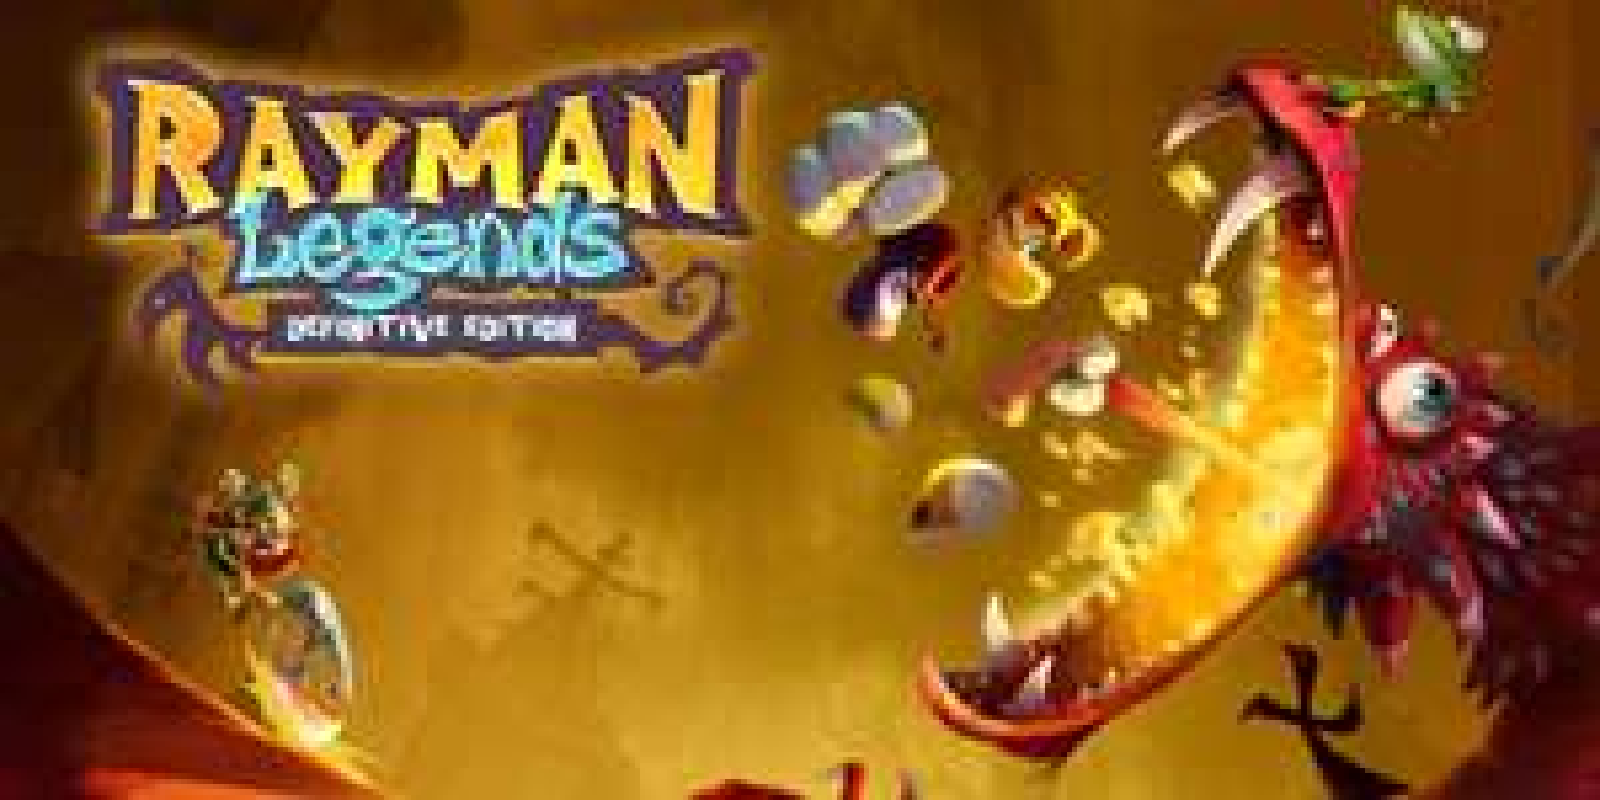 [Nintendo] Rayman Legends: Definitive Edition für Nintendo Switch